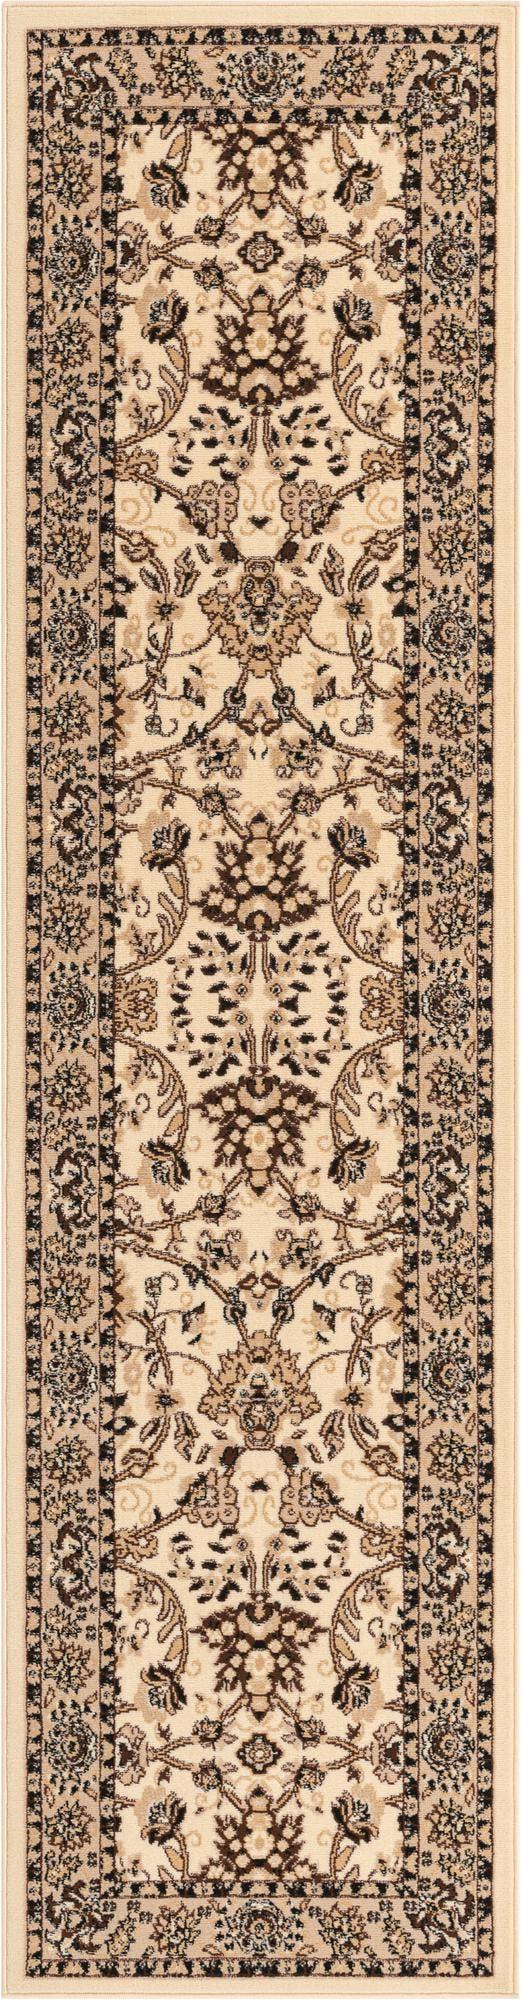 2' 7 x 10' Kashan Design Runner Rug main image